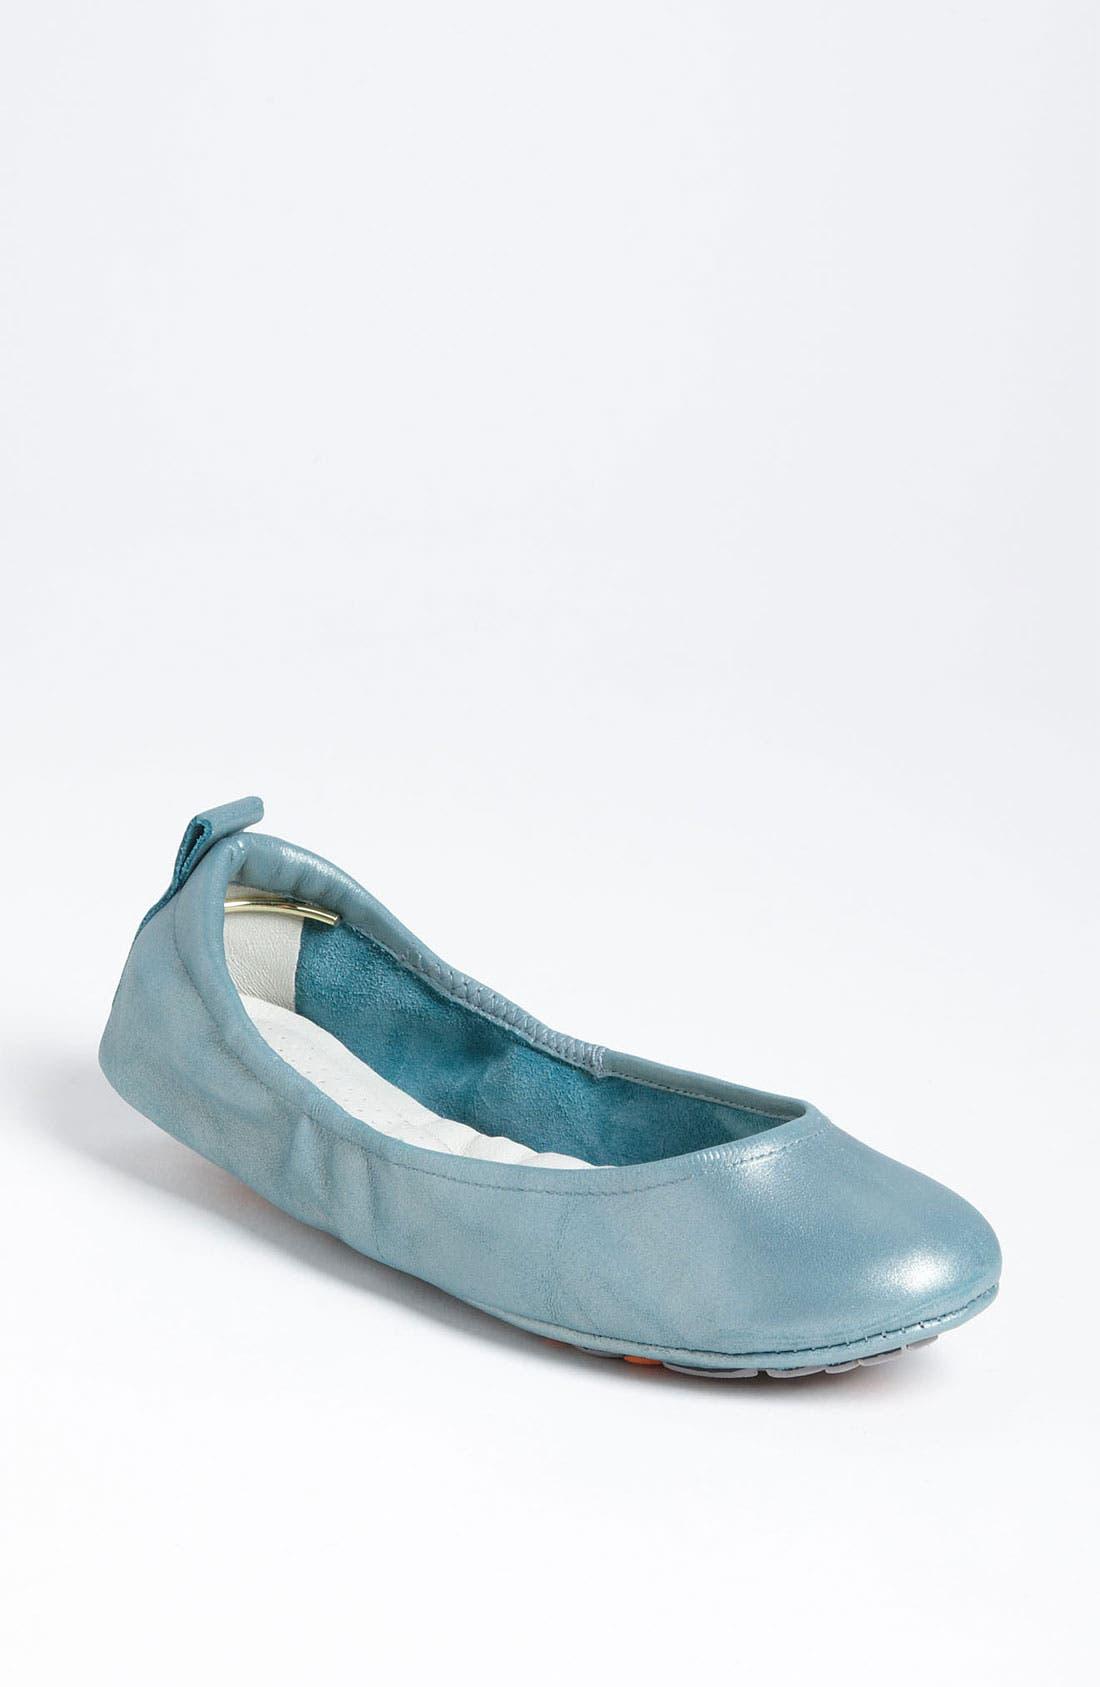 Alternate Image 1 Selected - Acorn 'Via' Ballet Flat (Online Only)